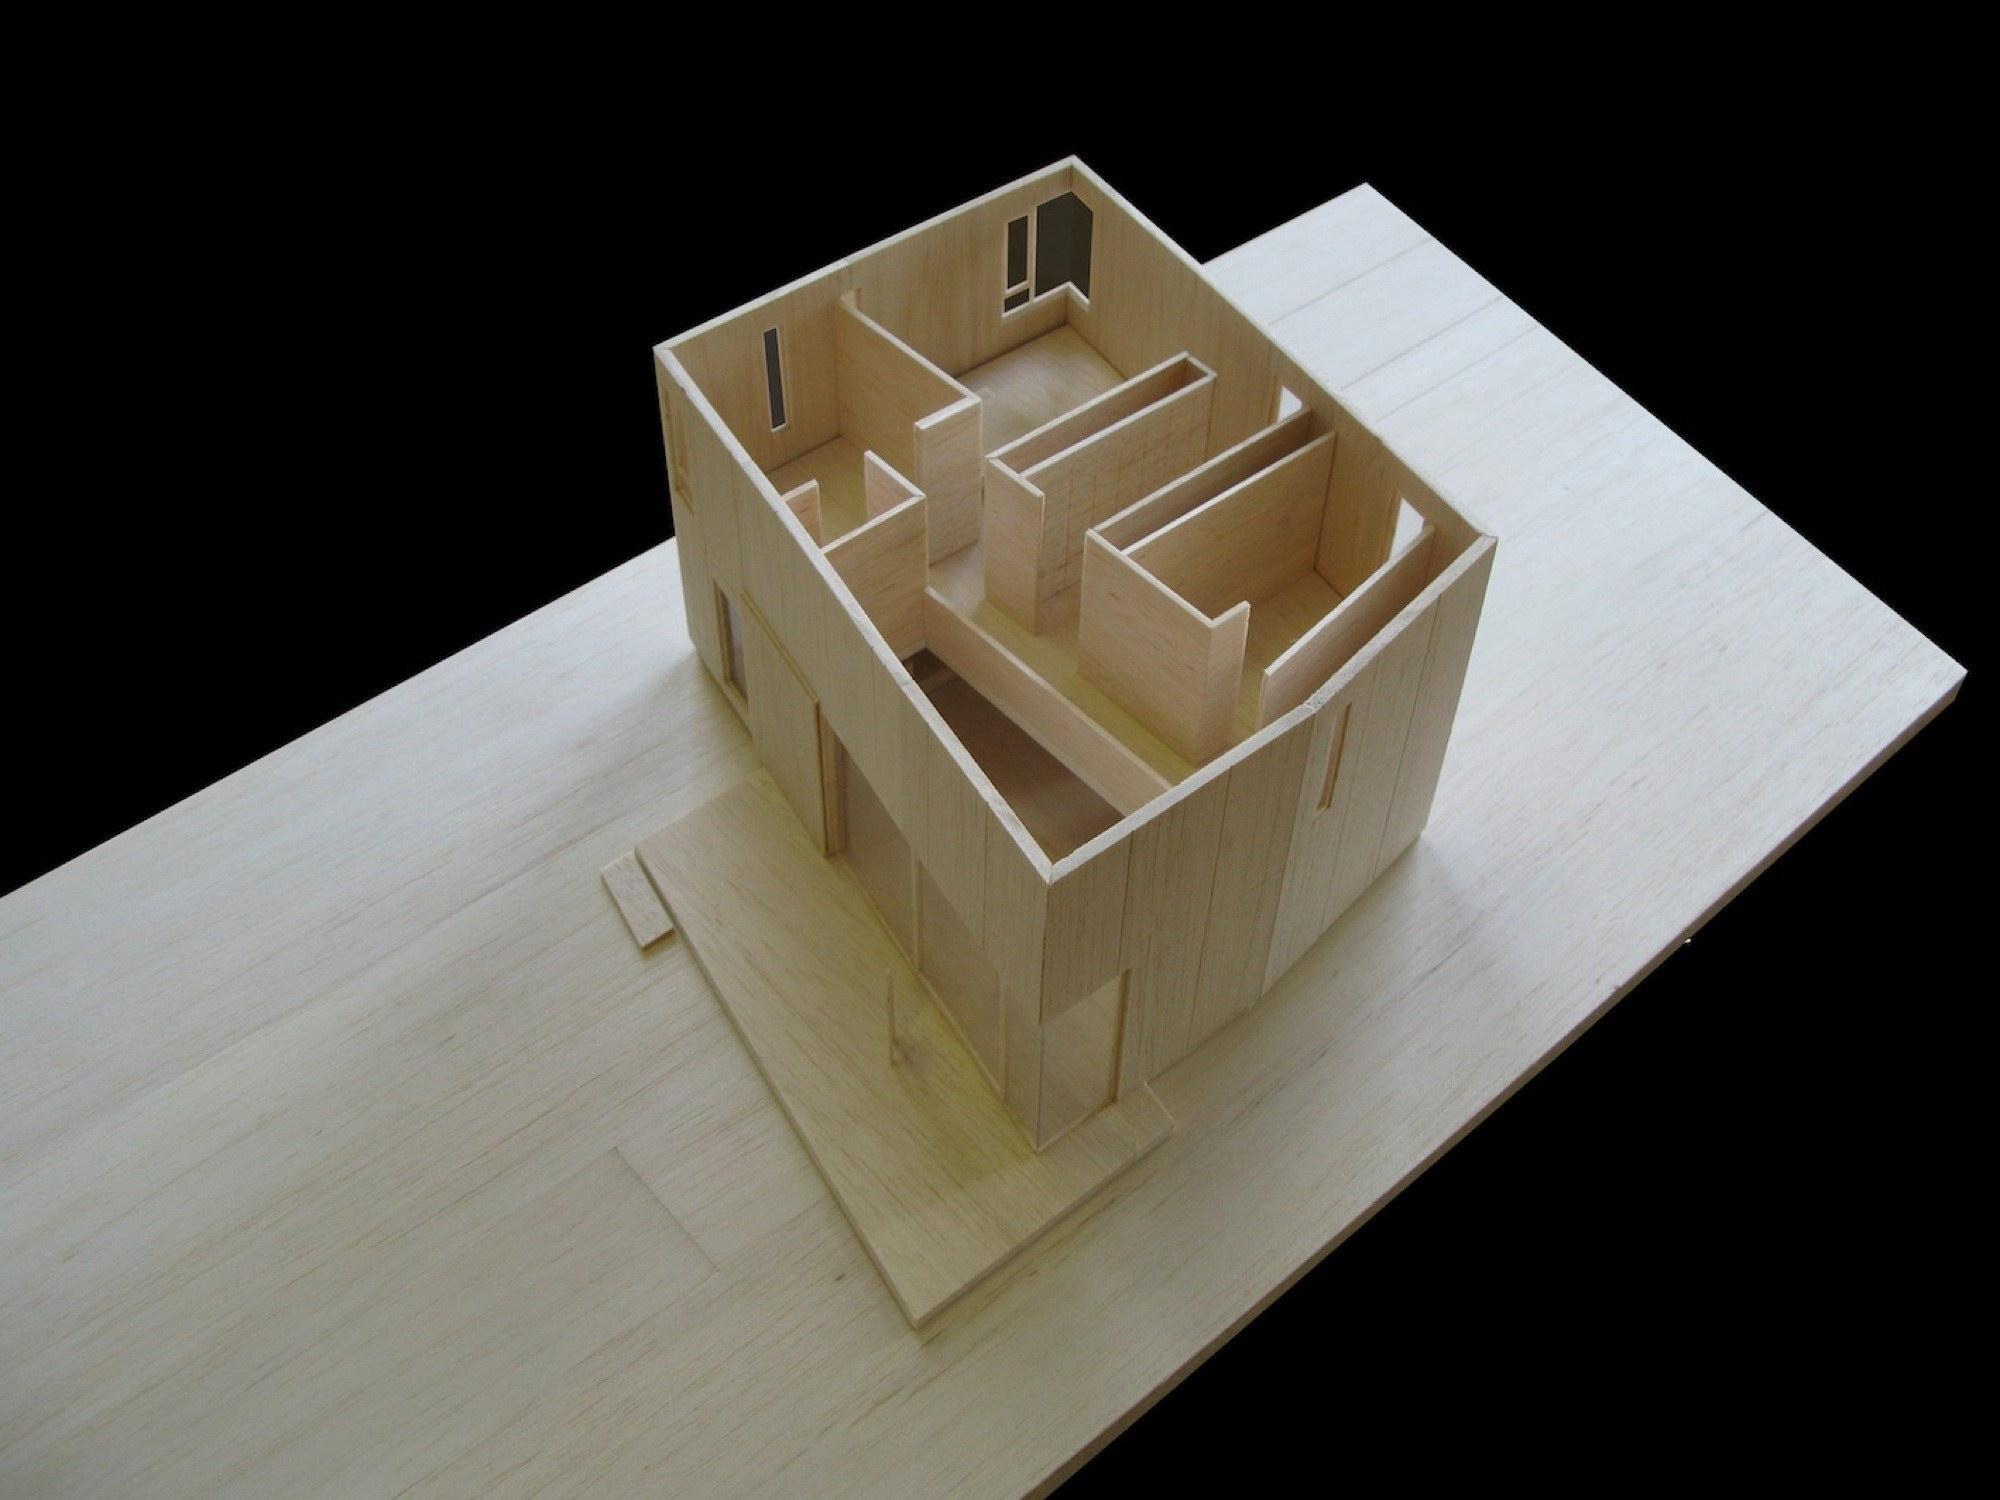 Villa DVT by Atelier Boetzkes and JCRARCHITECTEN